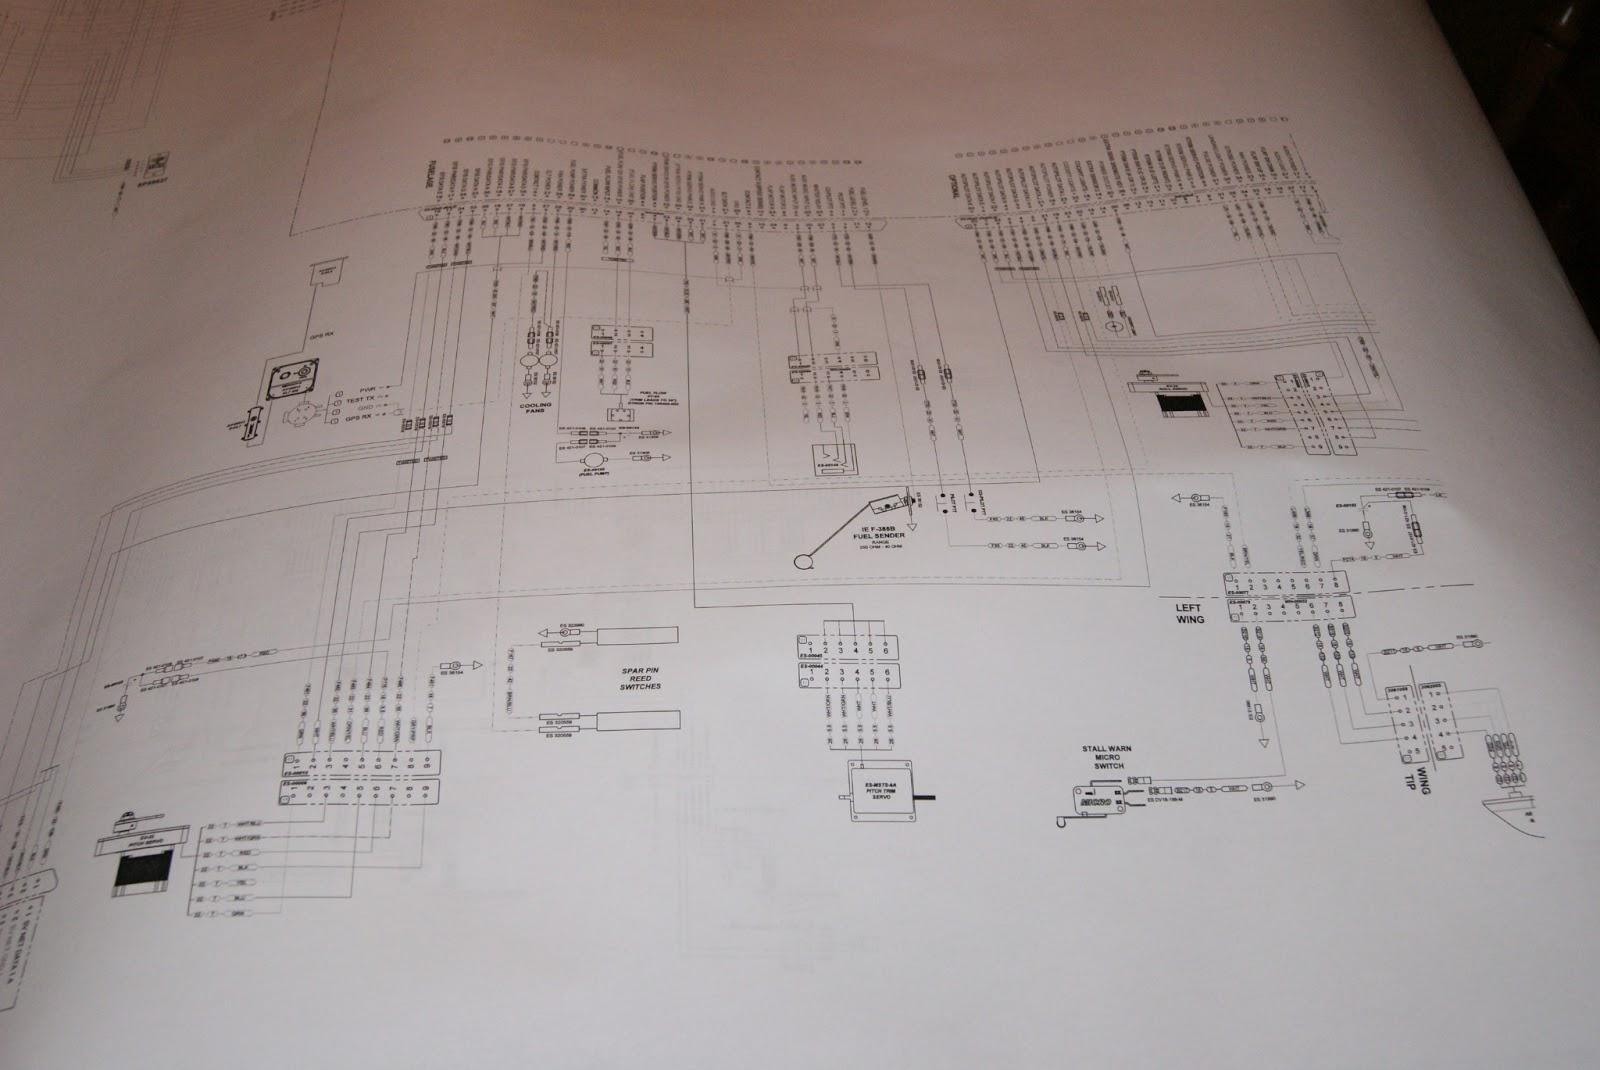 Sho Me Wig Wag Wiring Diagram Bmw X5 Dog Aviation John 39s Rv 12 Blog Lighting Pulse Is Ok